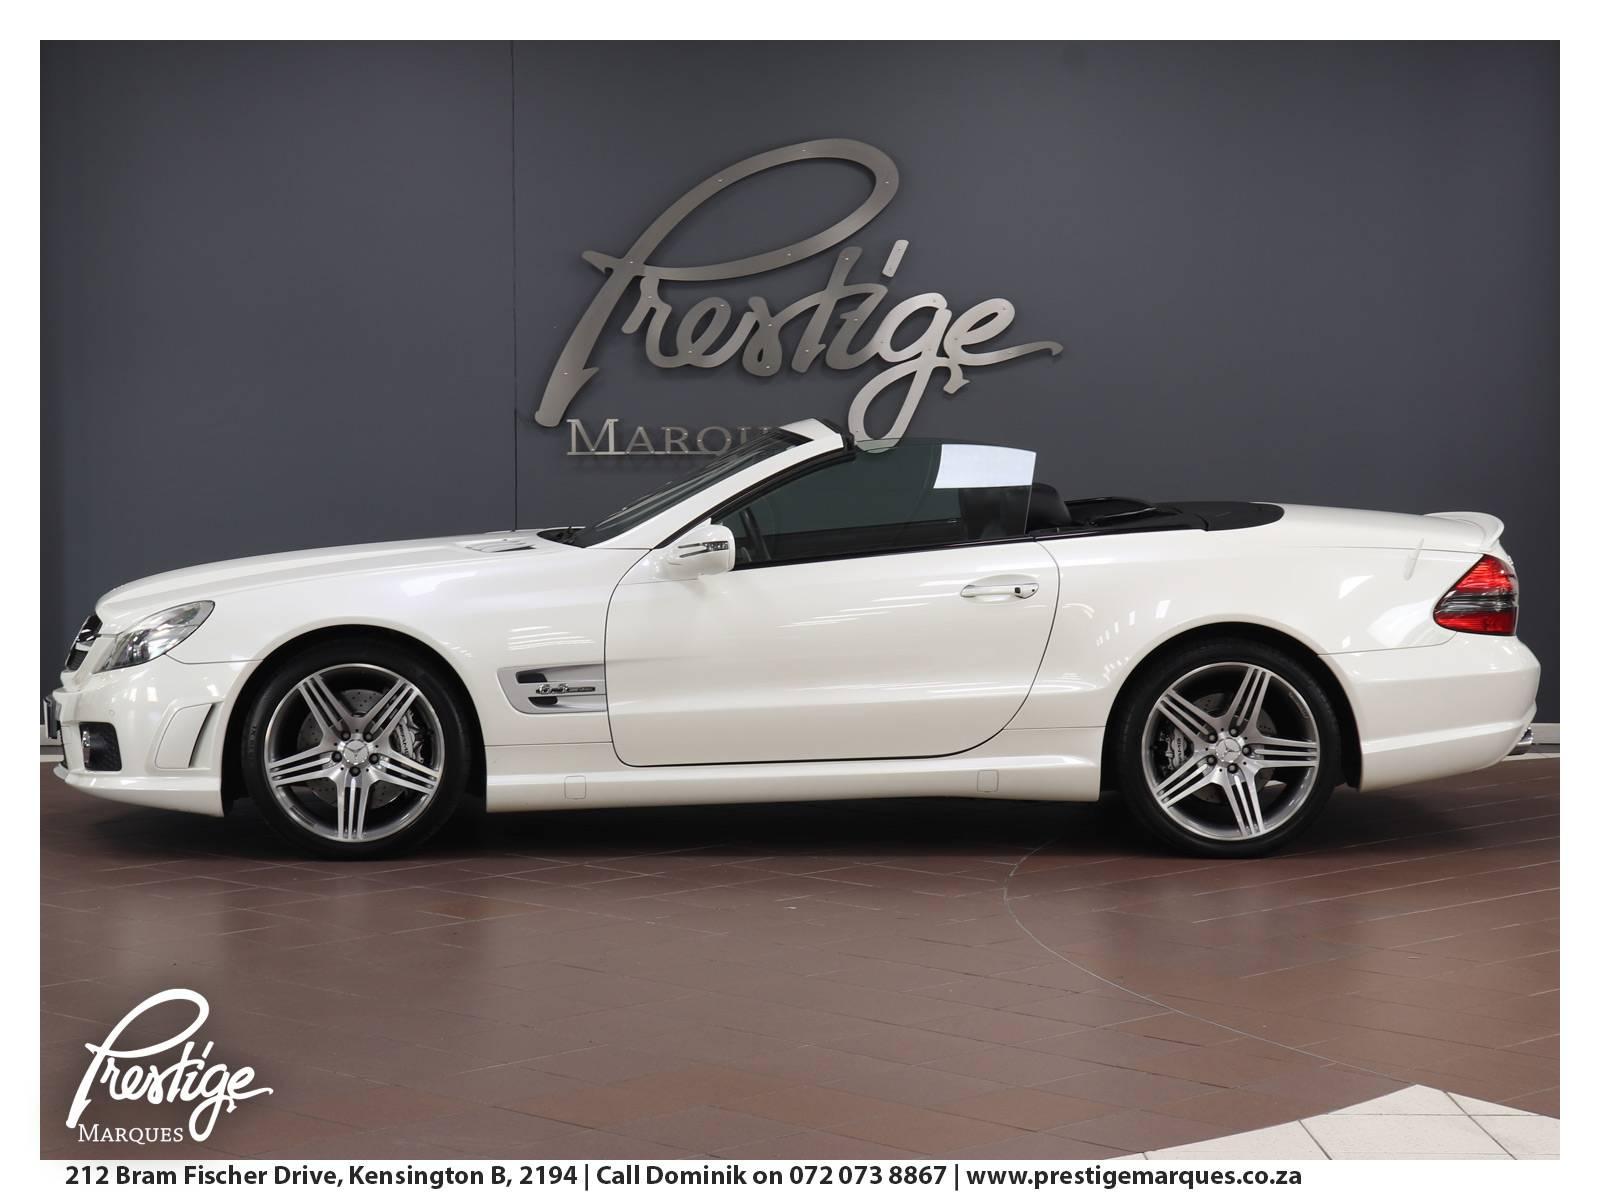 Mercedes-benz-sl-63-amg-prestige-marques-randburg-sandton-11